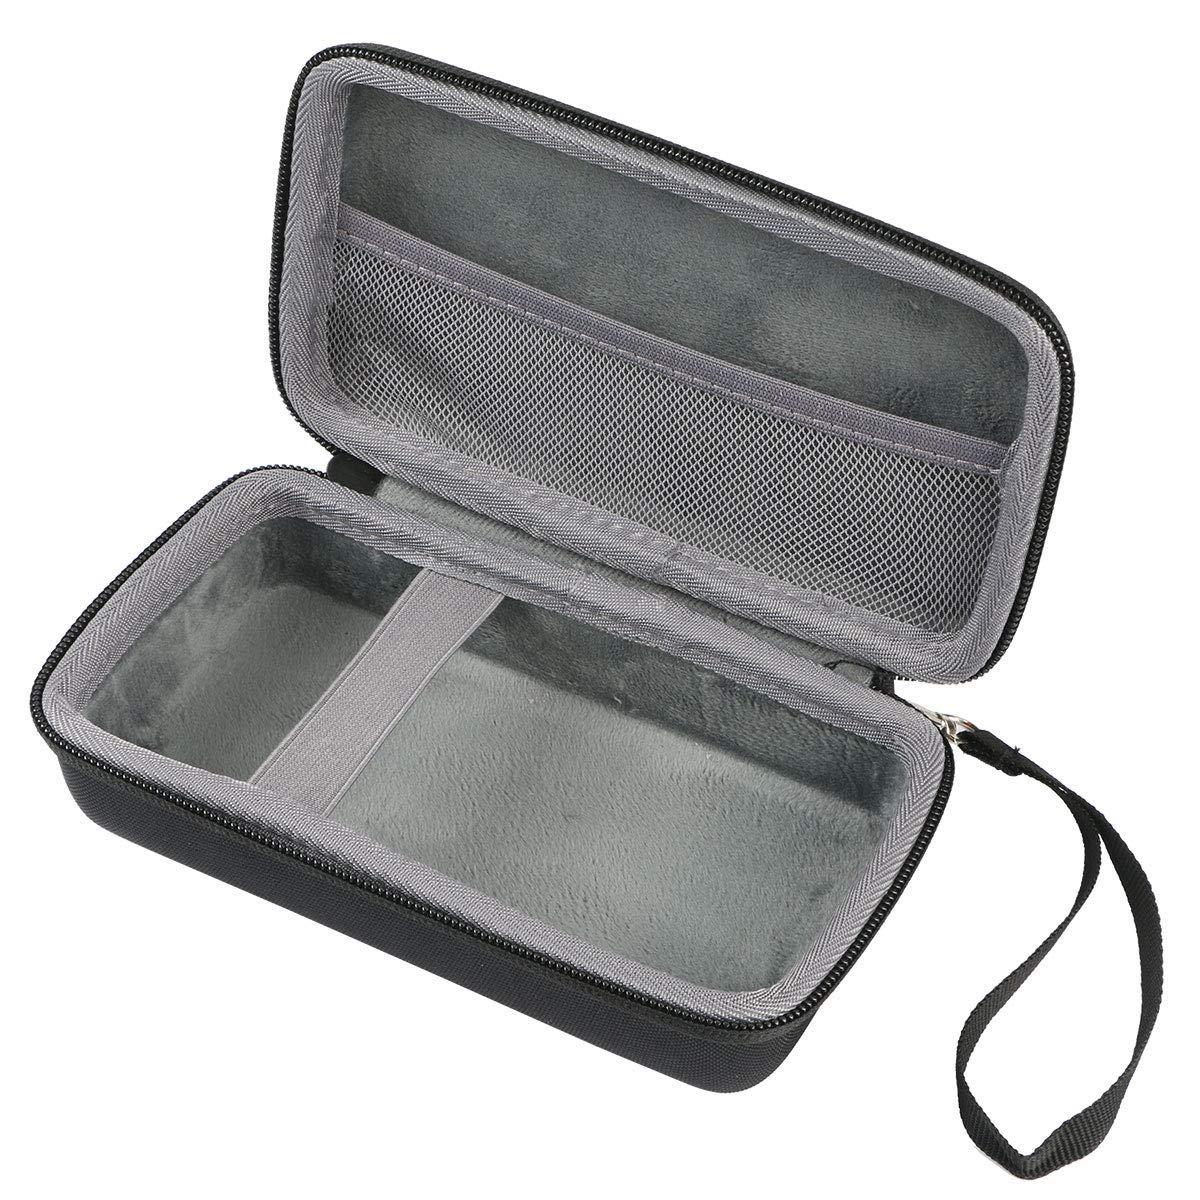 co2crea Hard Travel Case for Etekcity Lasergrip 1080 Infrared Thermometer Non-Contact Digital LaserTemperature Gun